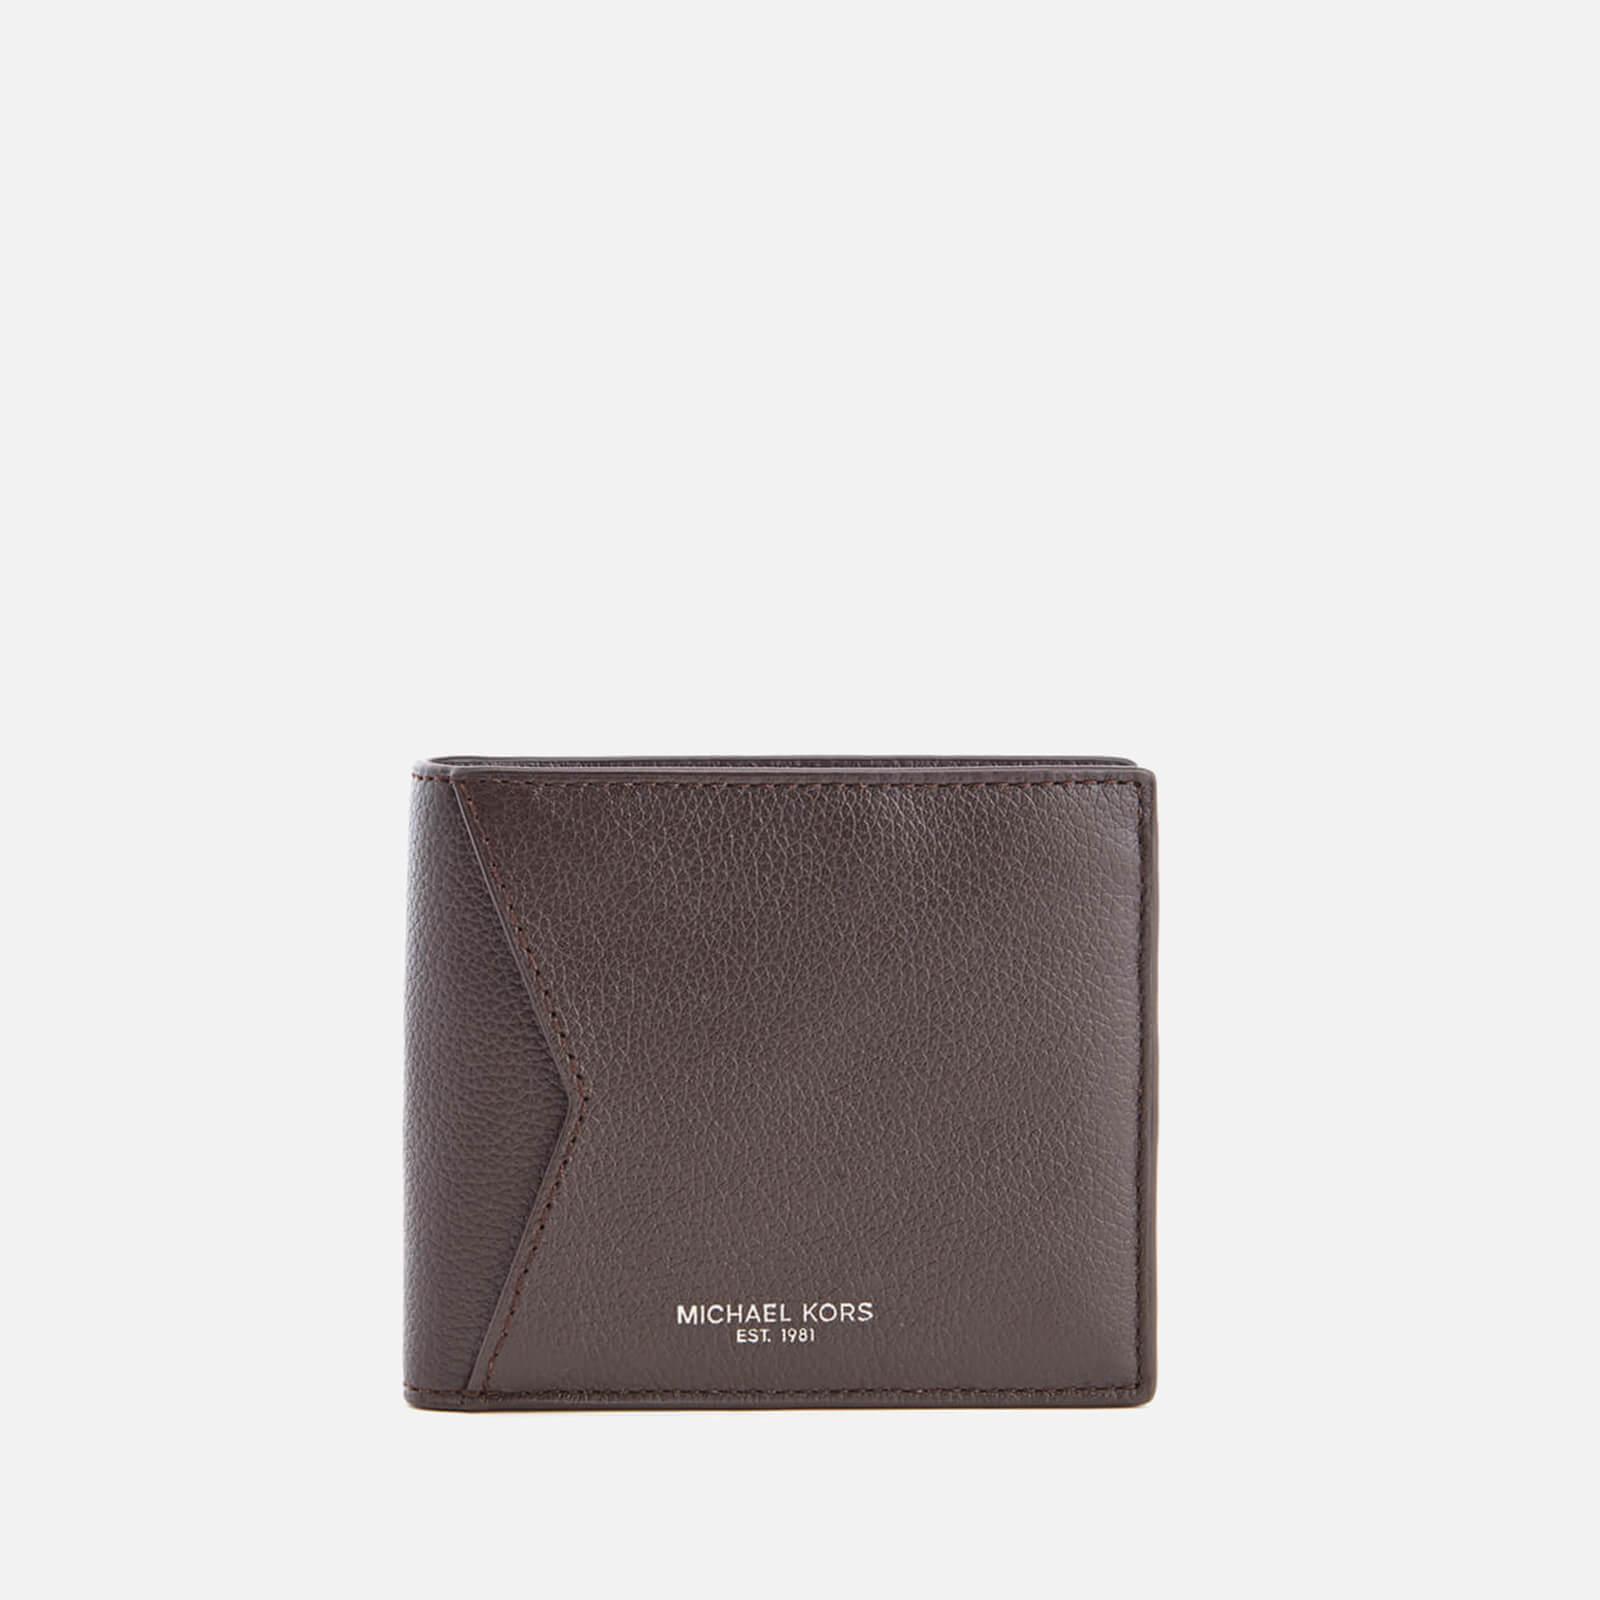 7b65647b49d802 ... Michael Kors Men's Bryant Billfold Wallet with Coin Pocket - Brown